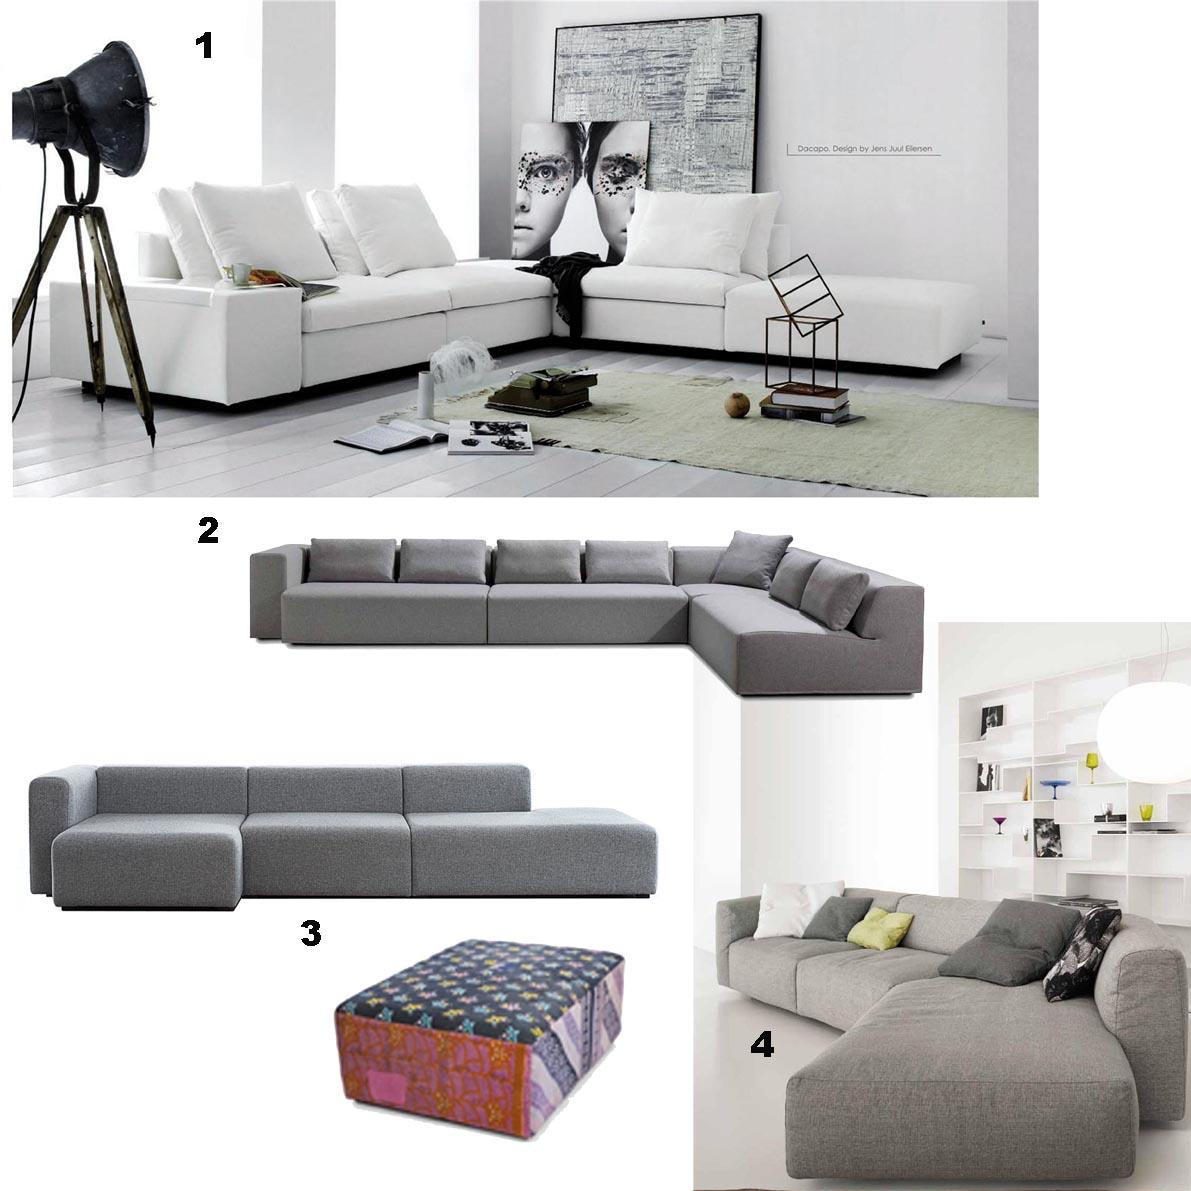 sofa-hjoernesofa-flyder-eilersen-hay-mag-ottoman-vintage-interior-design-oliform-mdf-italia-eilersen